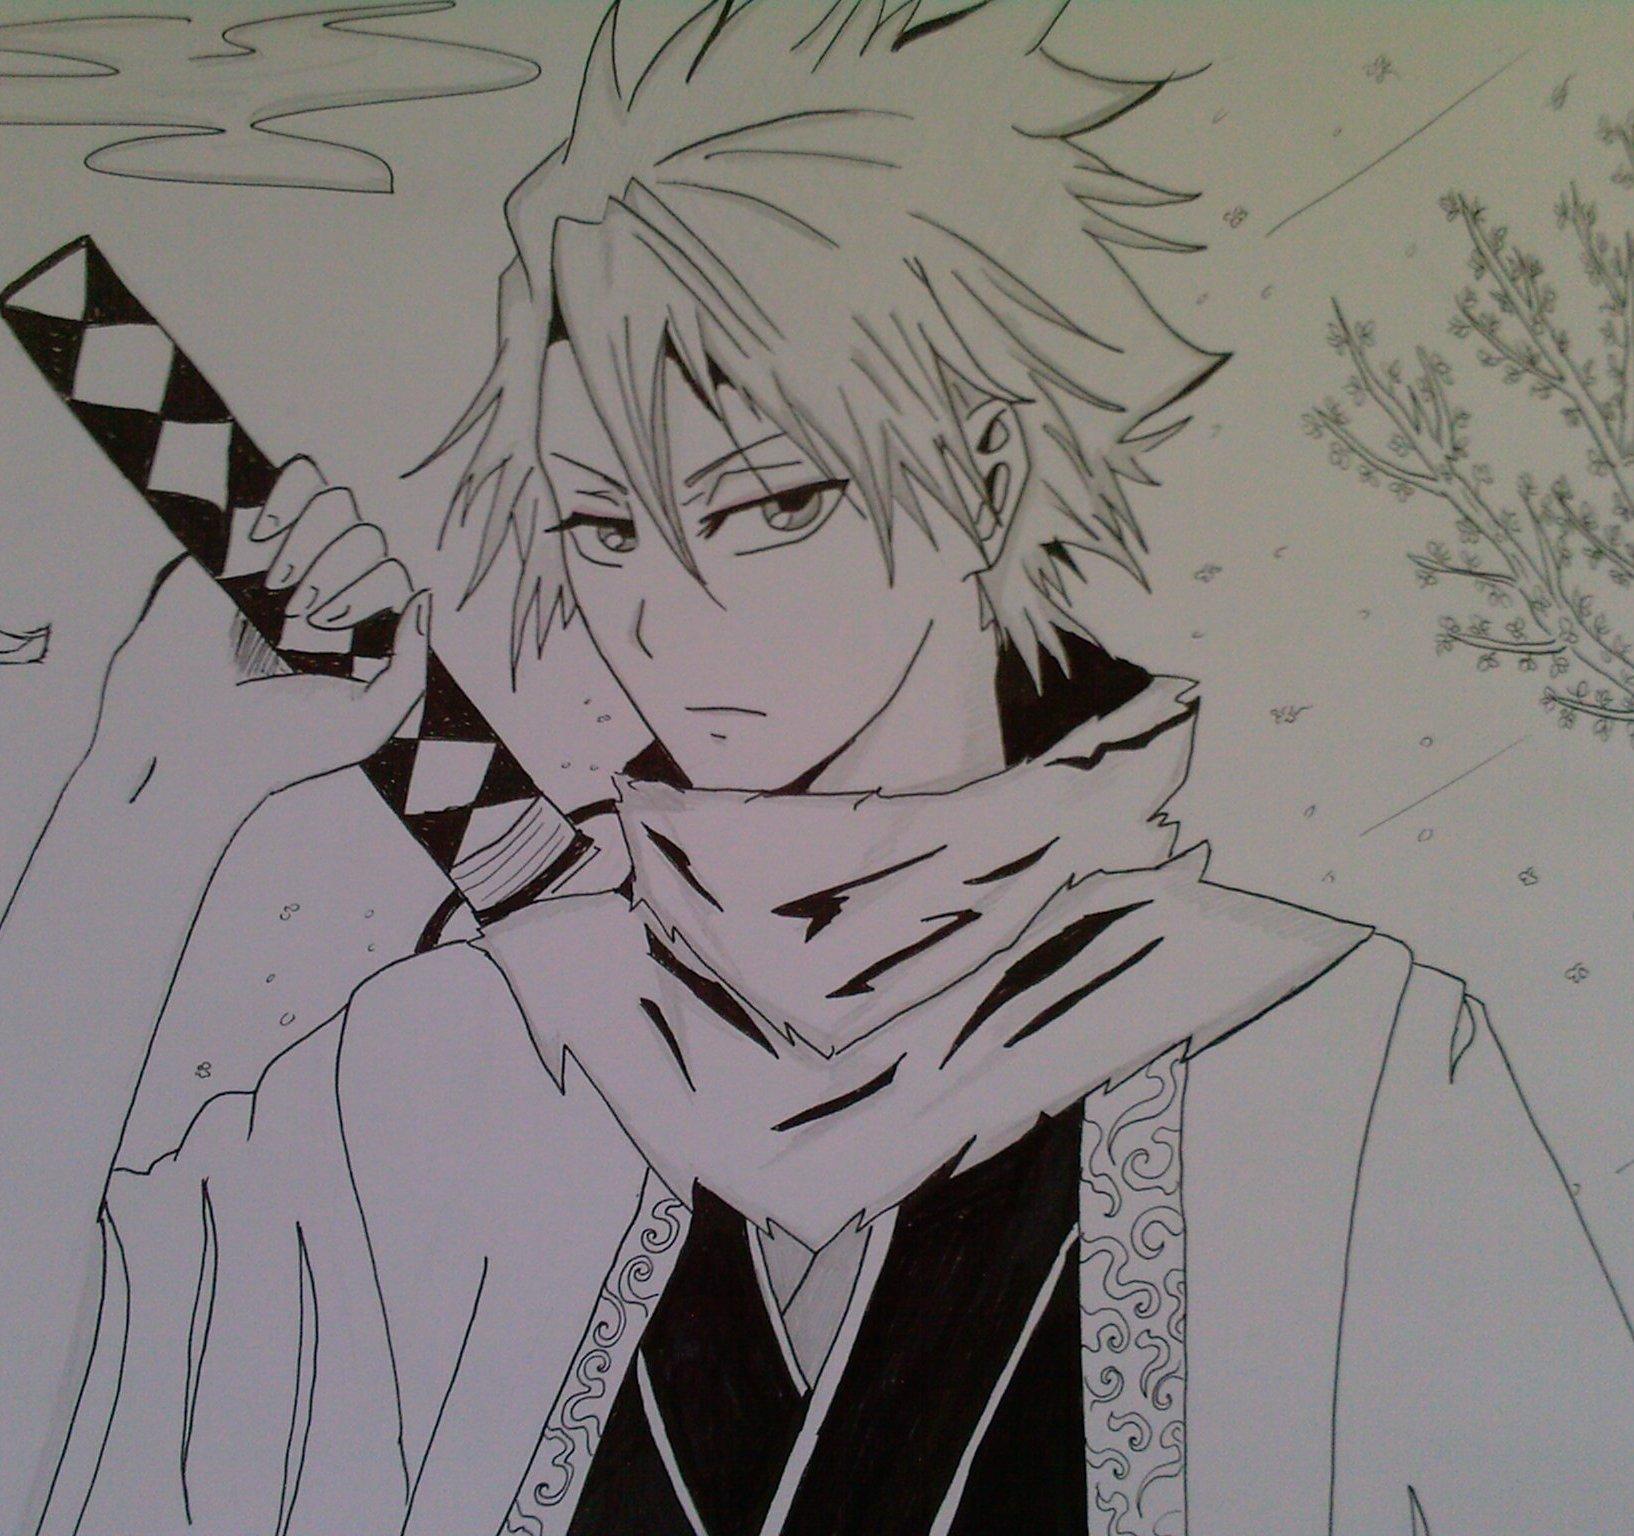 Deadman Wonderland Hd Wallpaper Drawing Anime Images Shiro Hd Wallpaper And Background